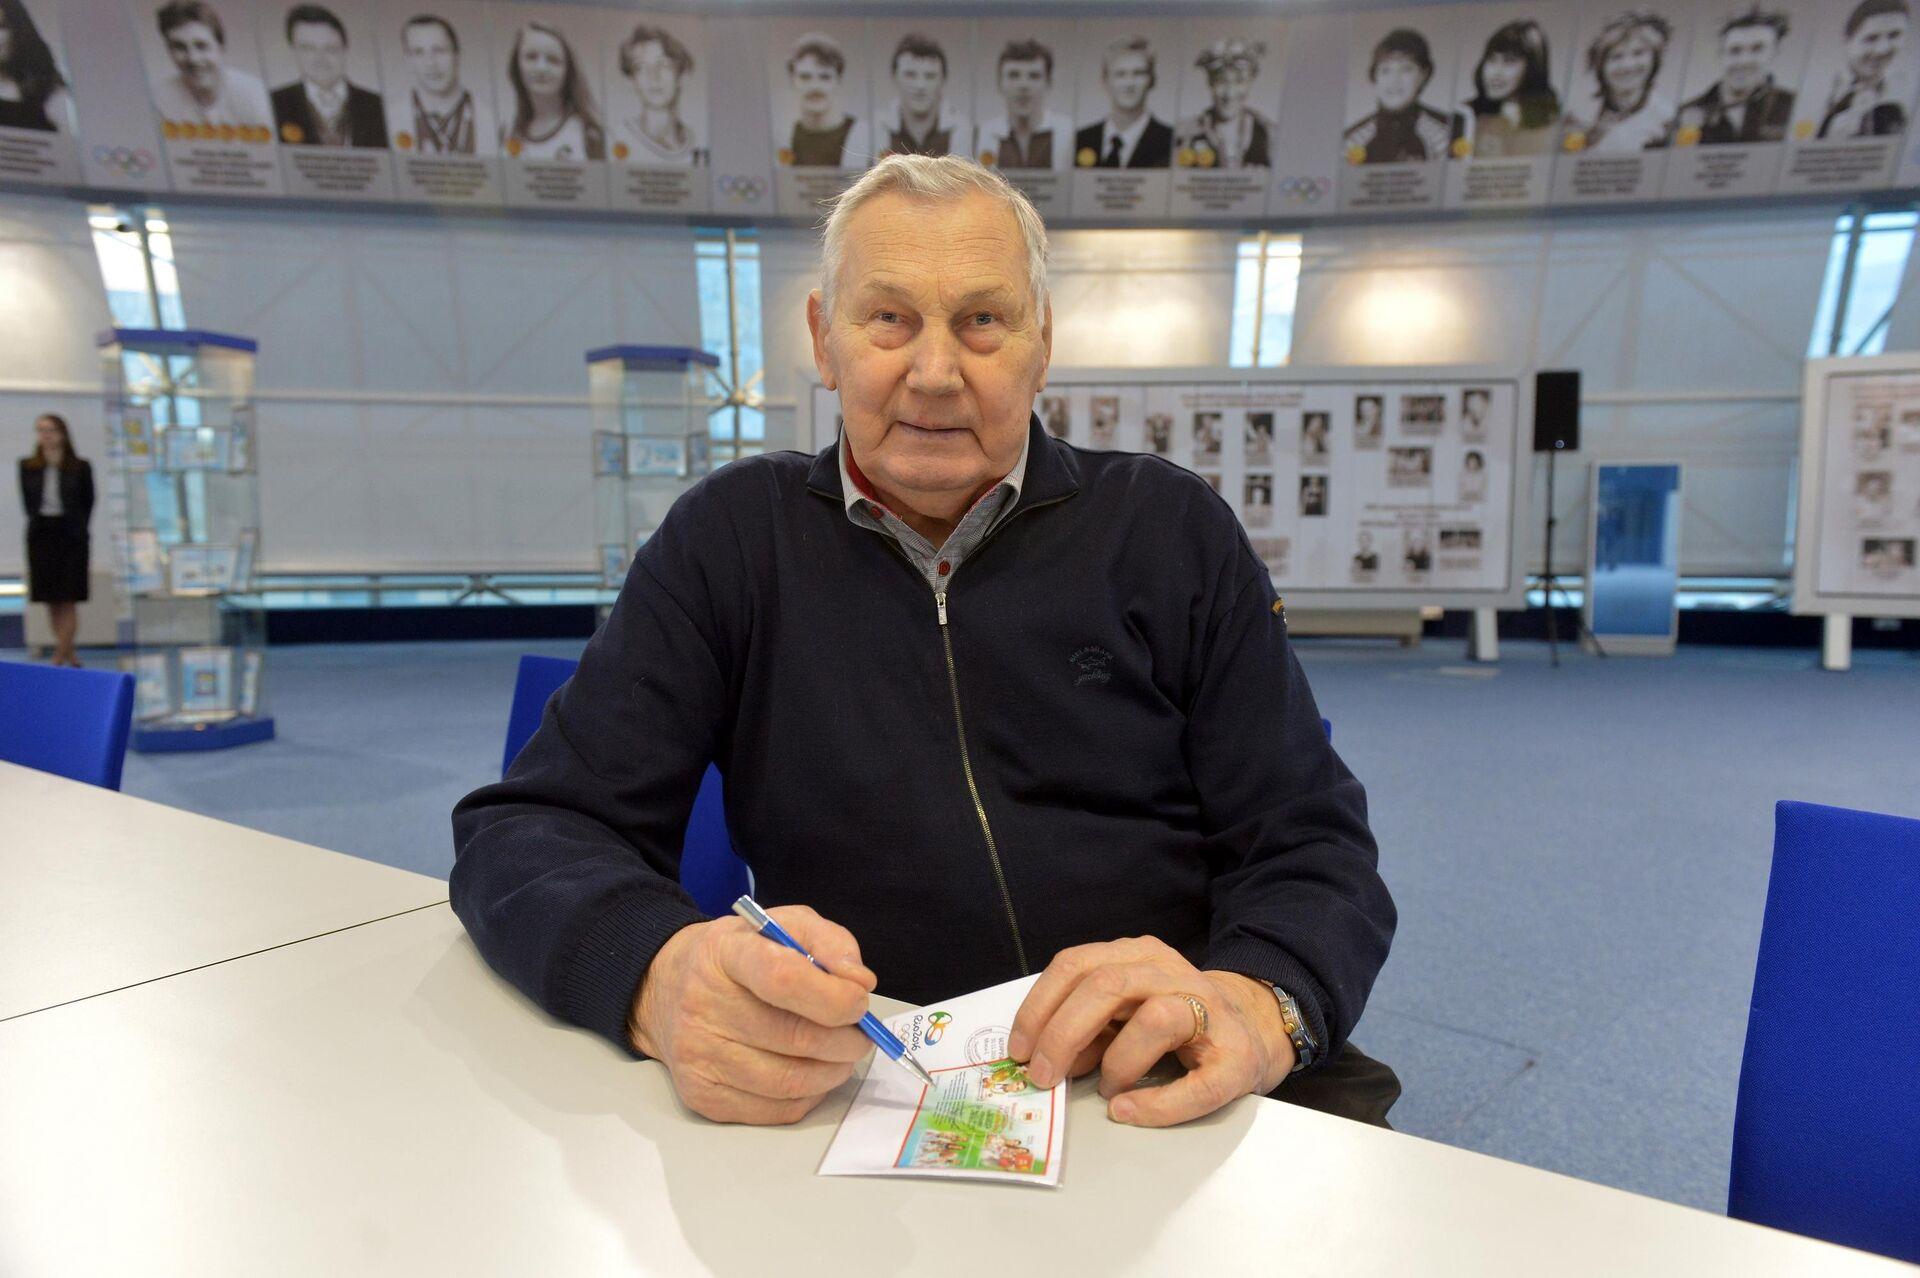 Многократный олимпийский чемпион Александр Медведь - Sputnik Беларусь, 1920, 23.07.2021